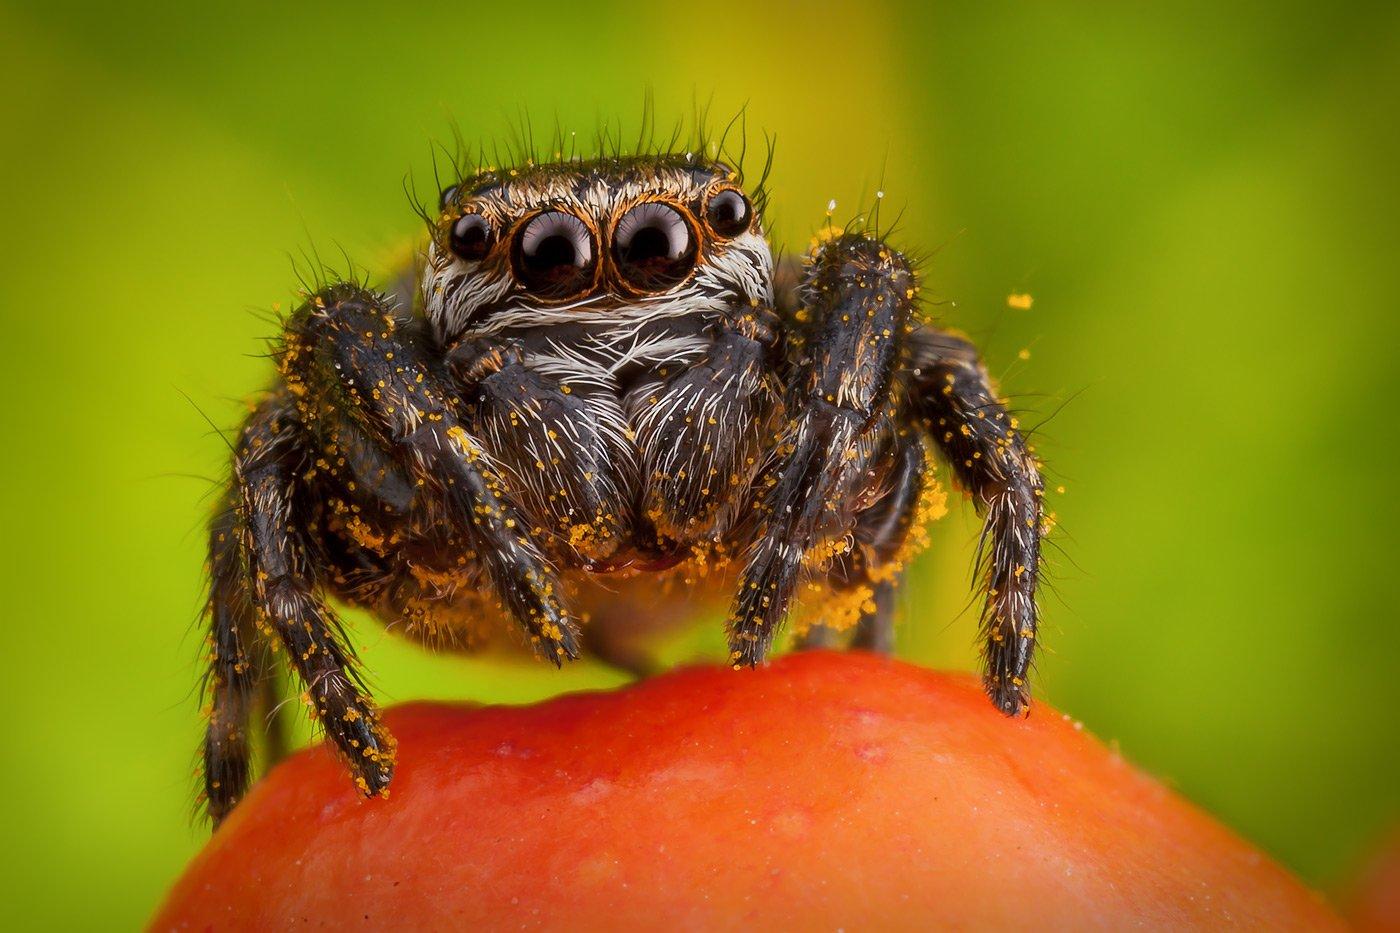 паук, скакун, pябина, макро, пыльца,, Linas T